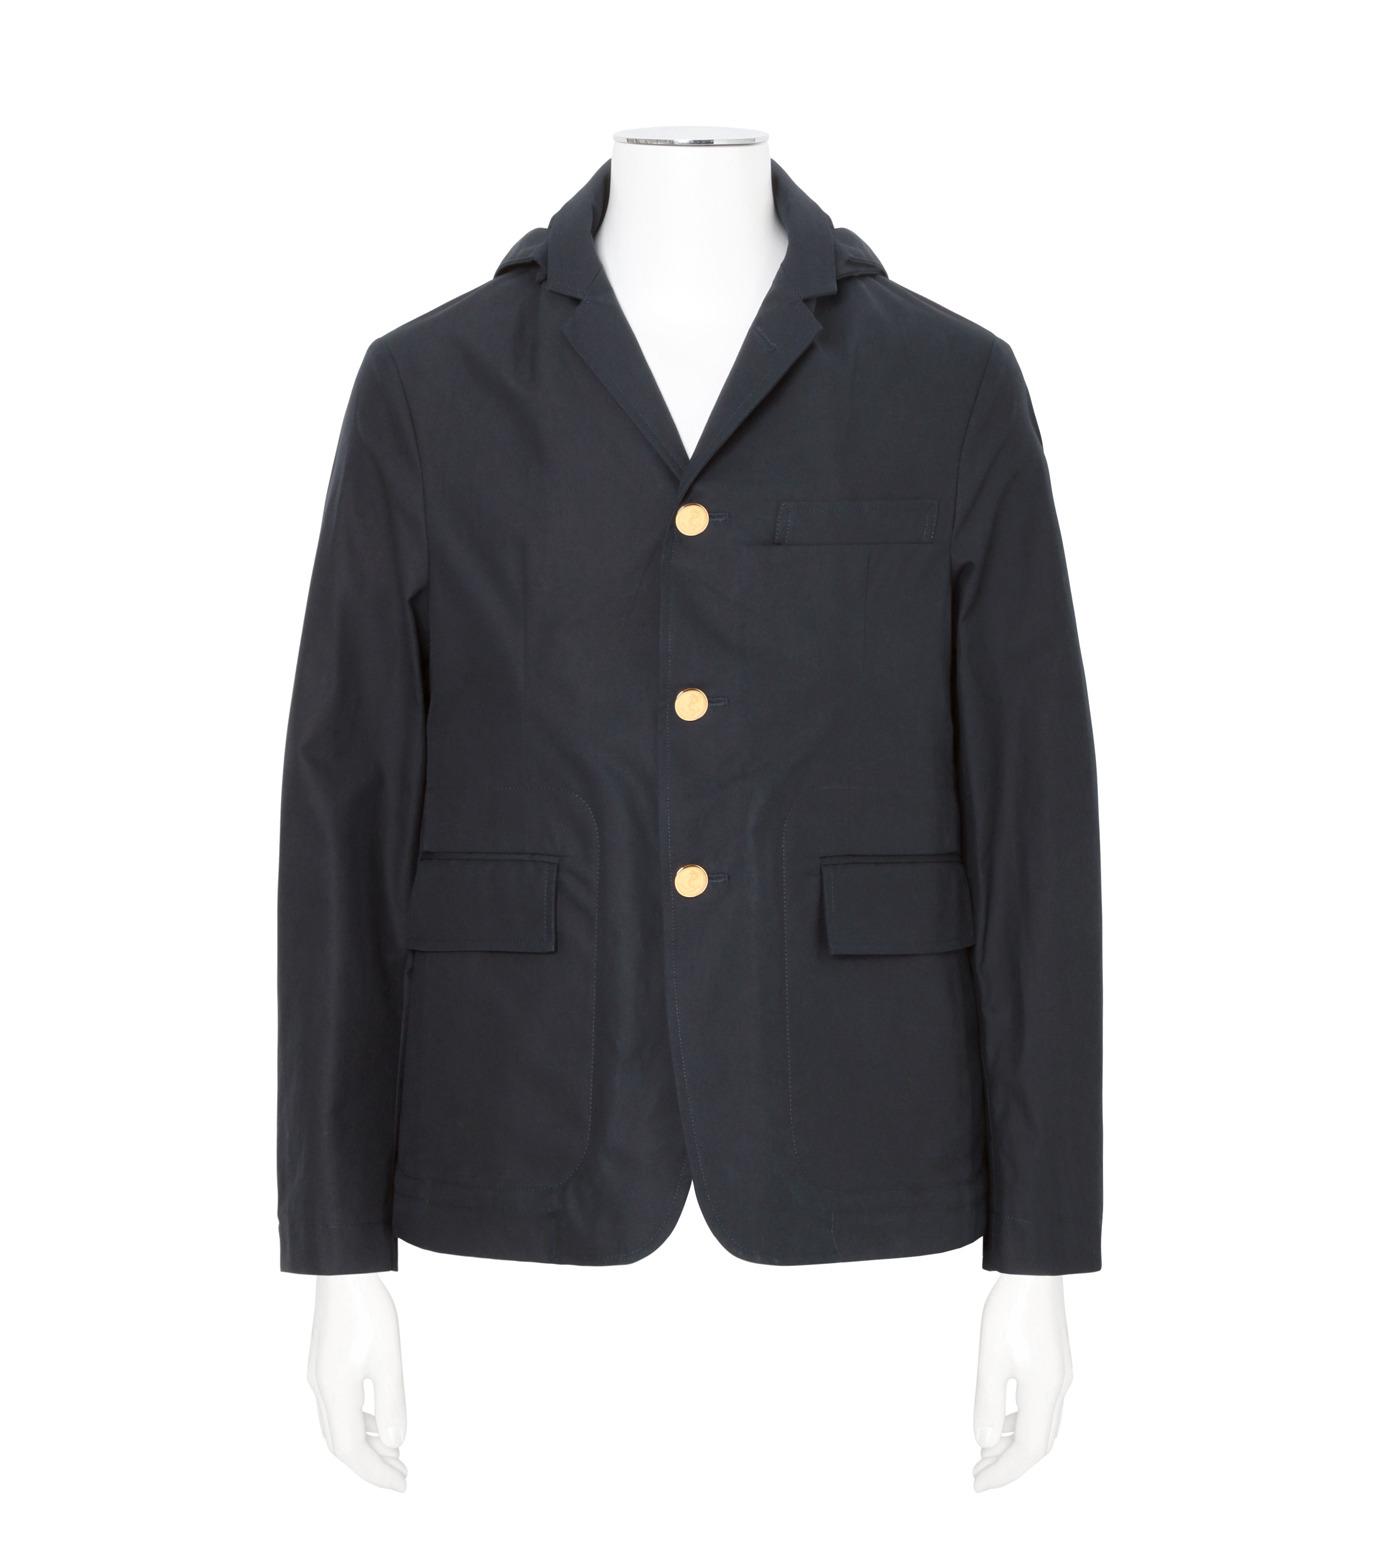 Thom Browne(トムブラウン)のDetachable Hood Jacket-NAVY(ジャケット/jacket)-A0163I20170-93 拡大詳細画像1